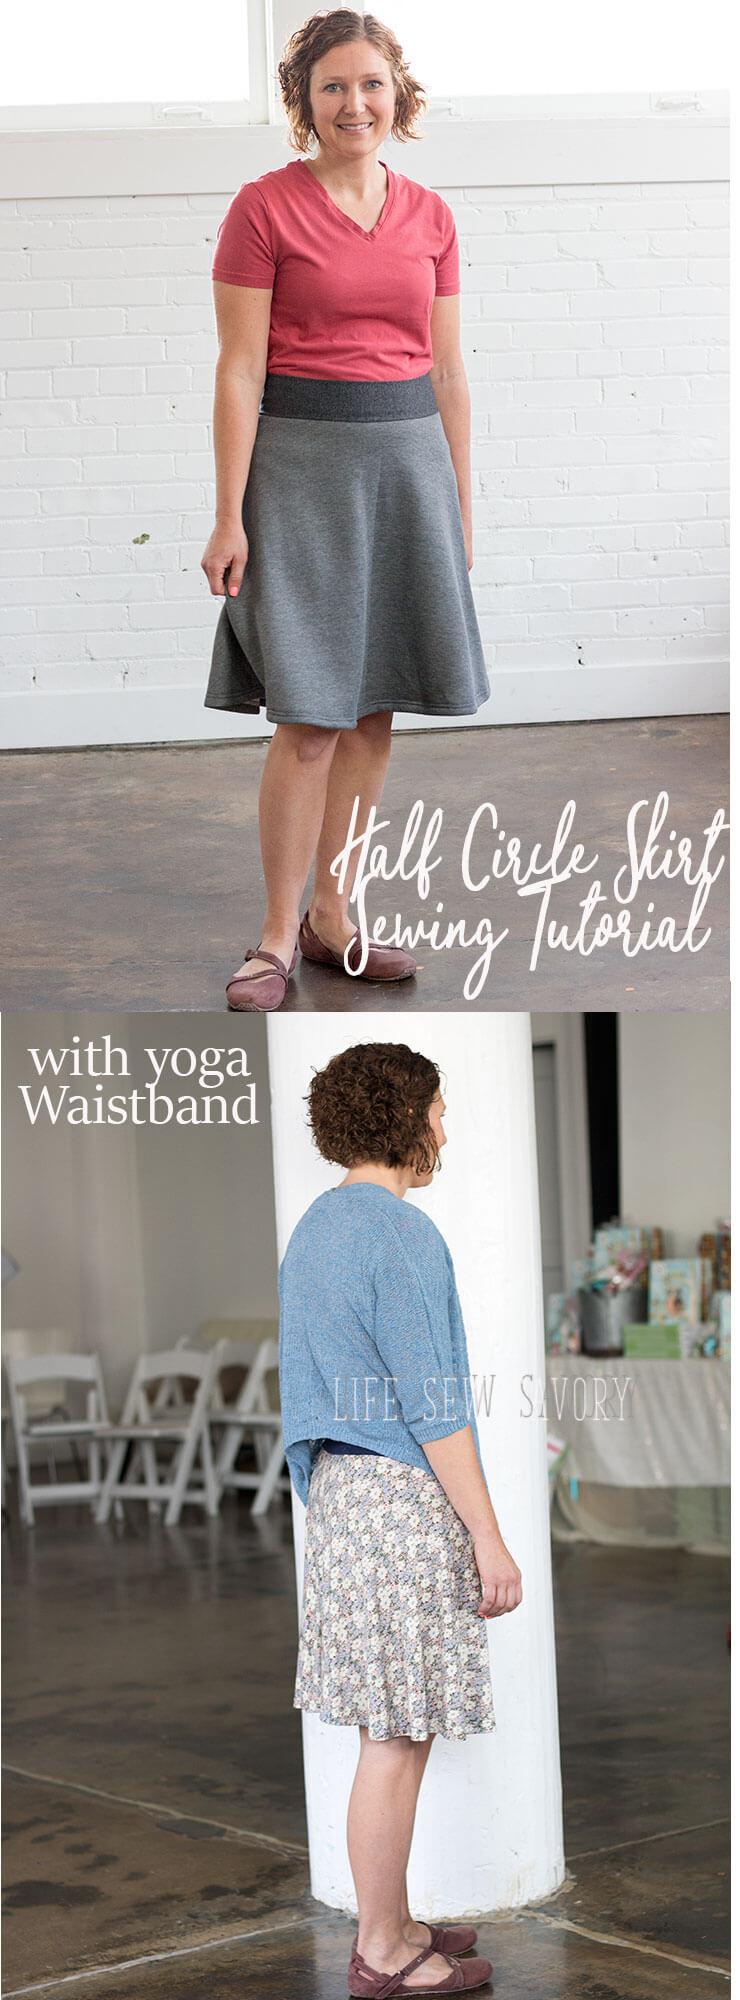 half circle skirt tutorial with yoga waistband from Life Sew Savory